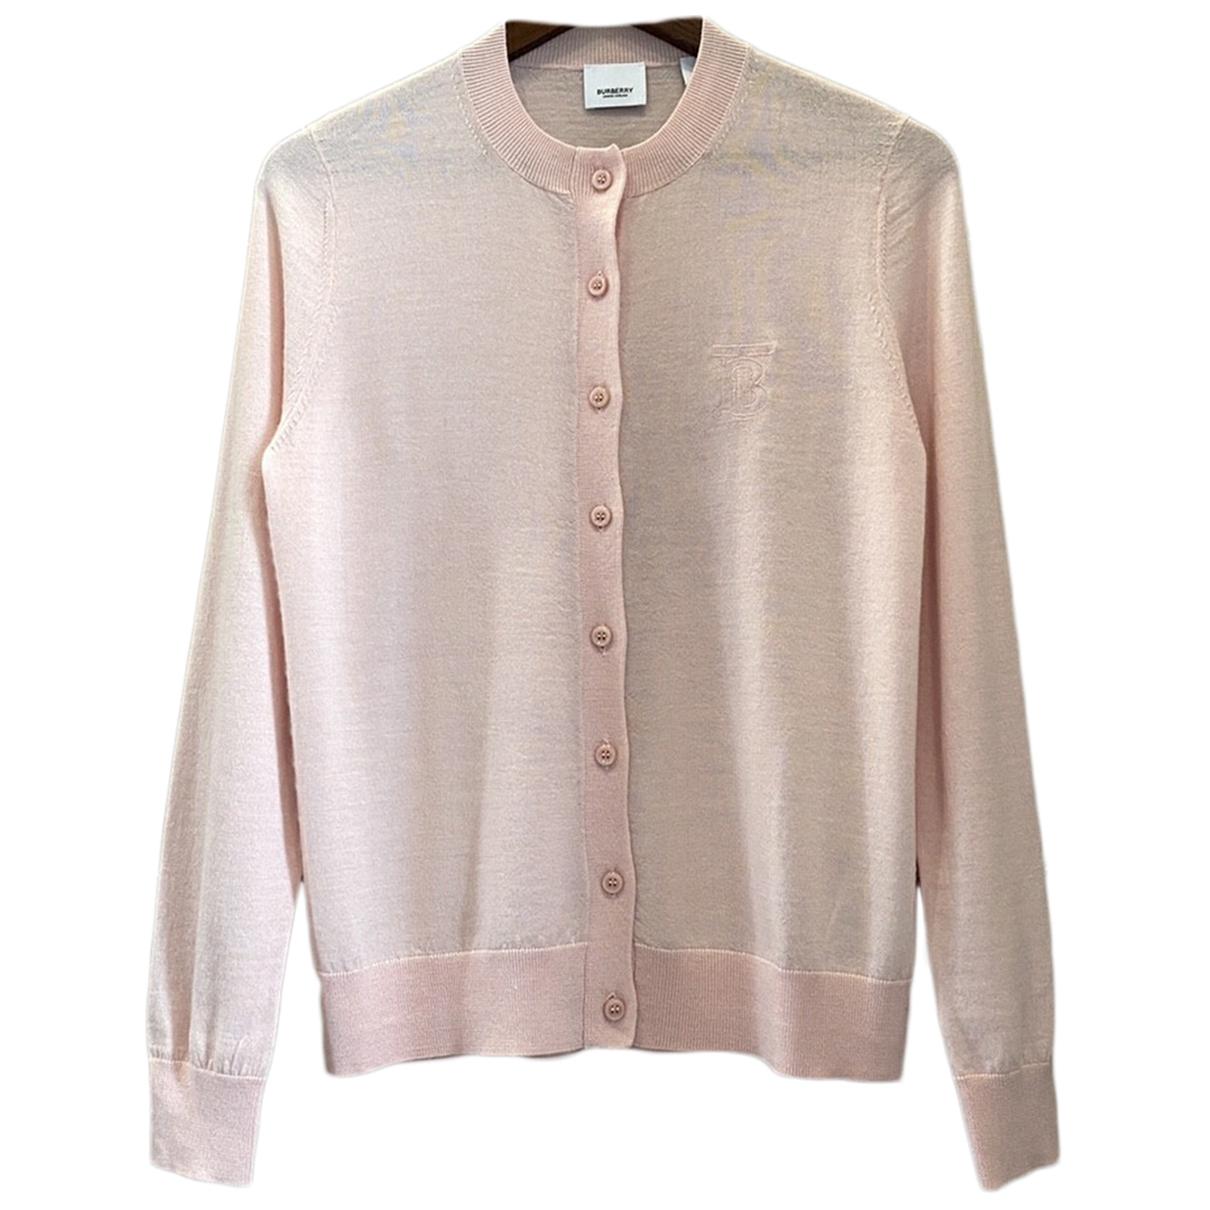 Burberry \N Pink Cashmere Knitwear for Women S International